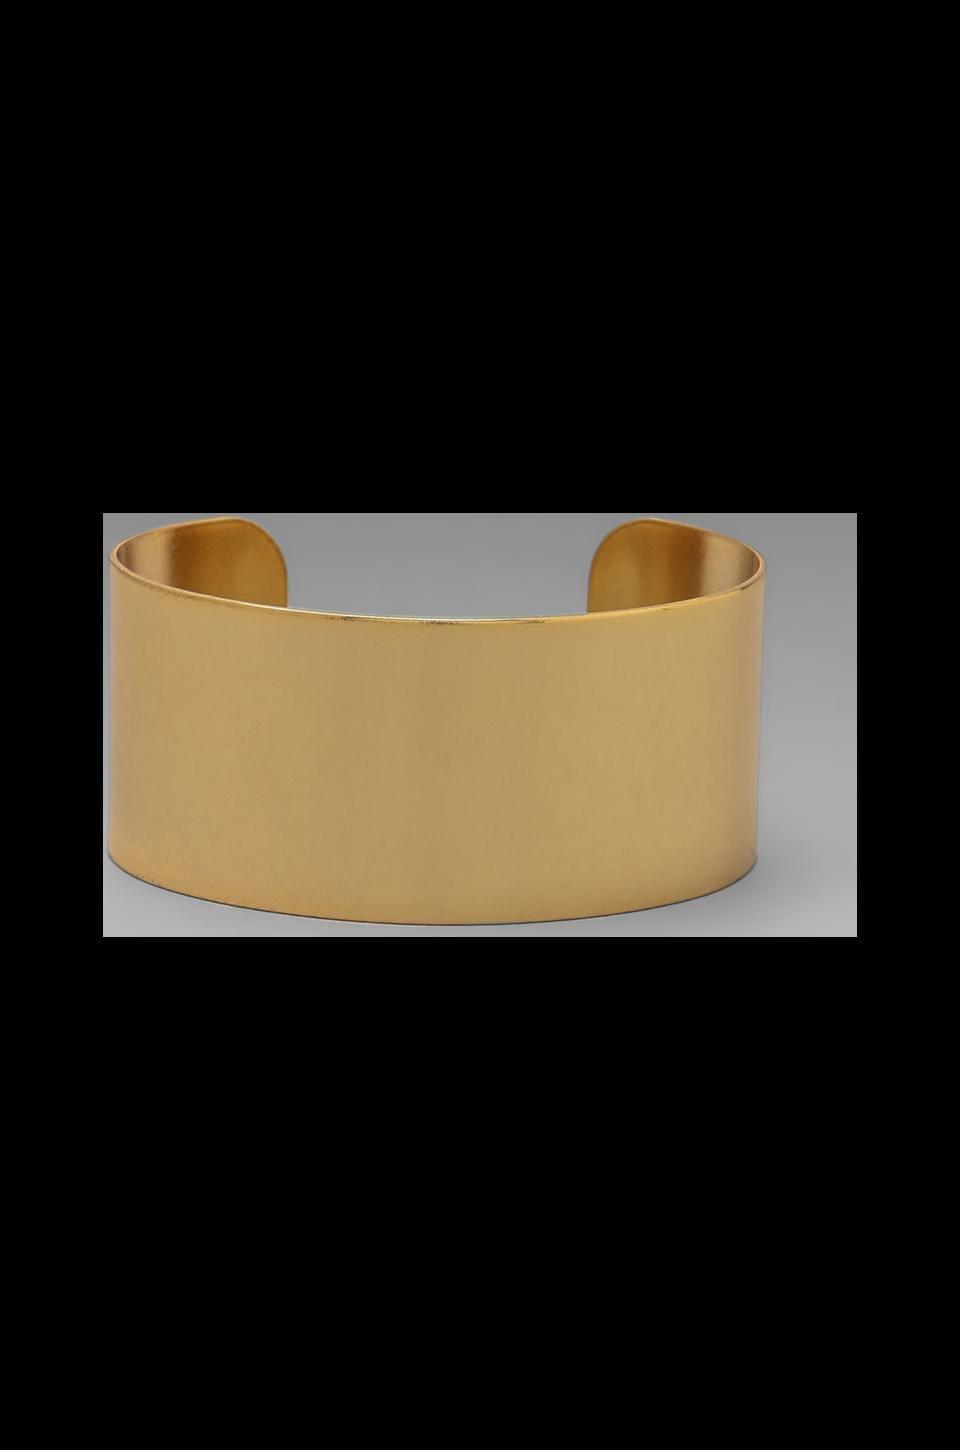 Luv AJ The Plain Cuff- Short in 24 Kt Gold